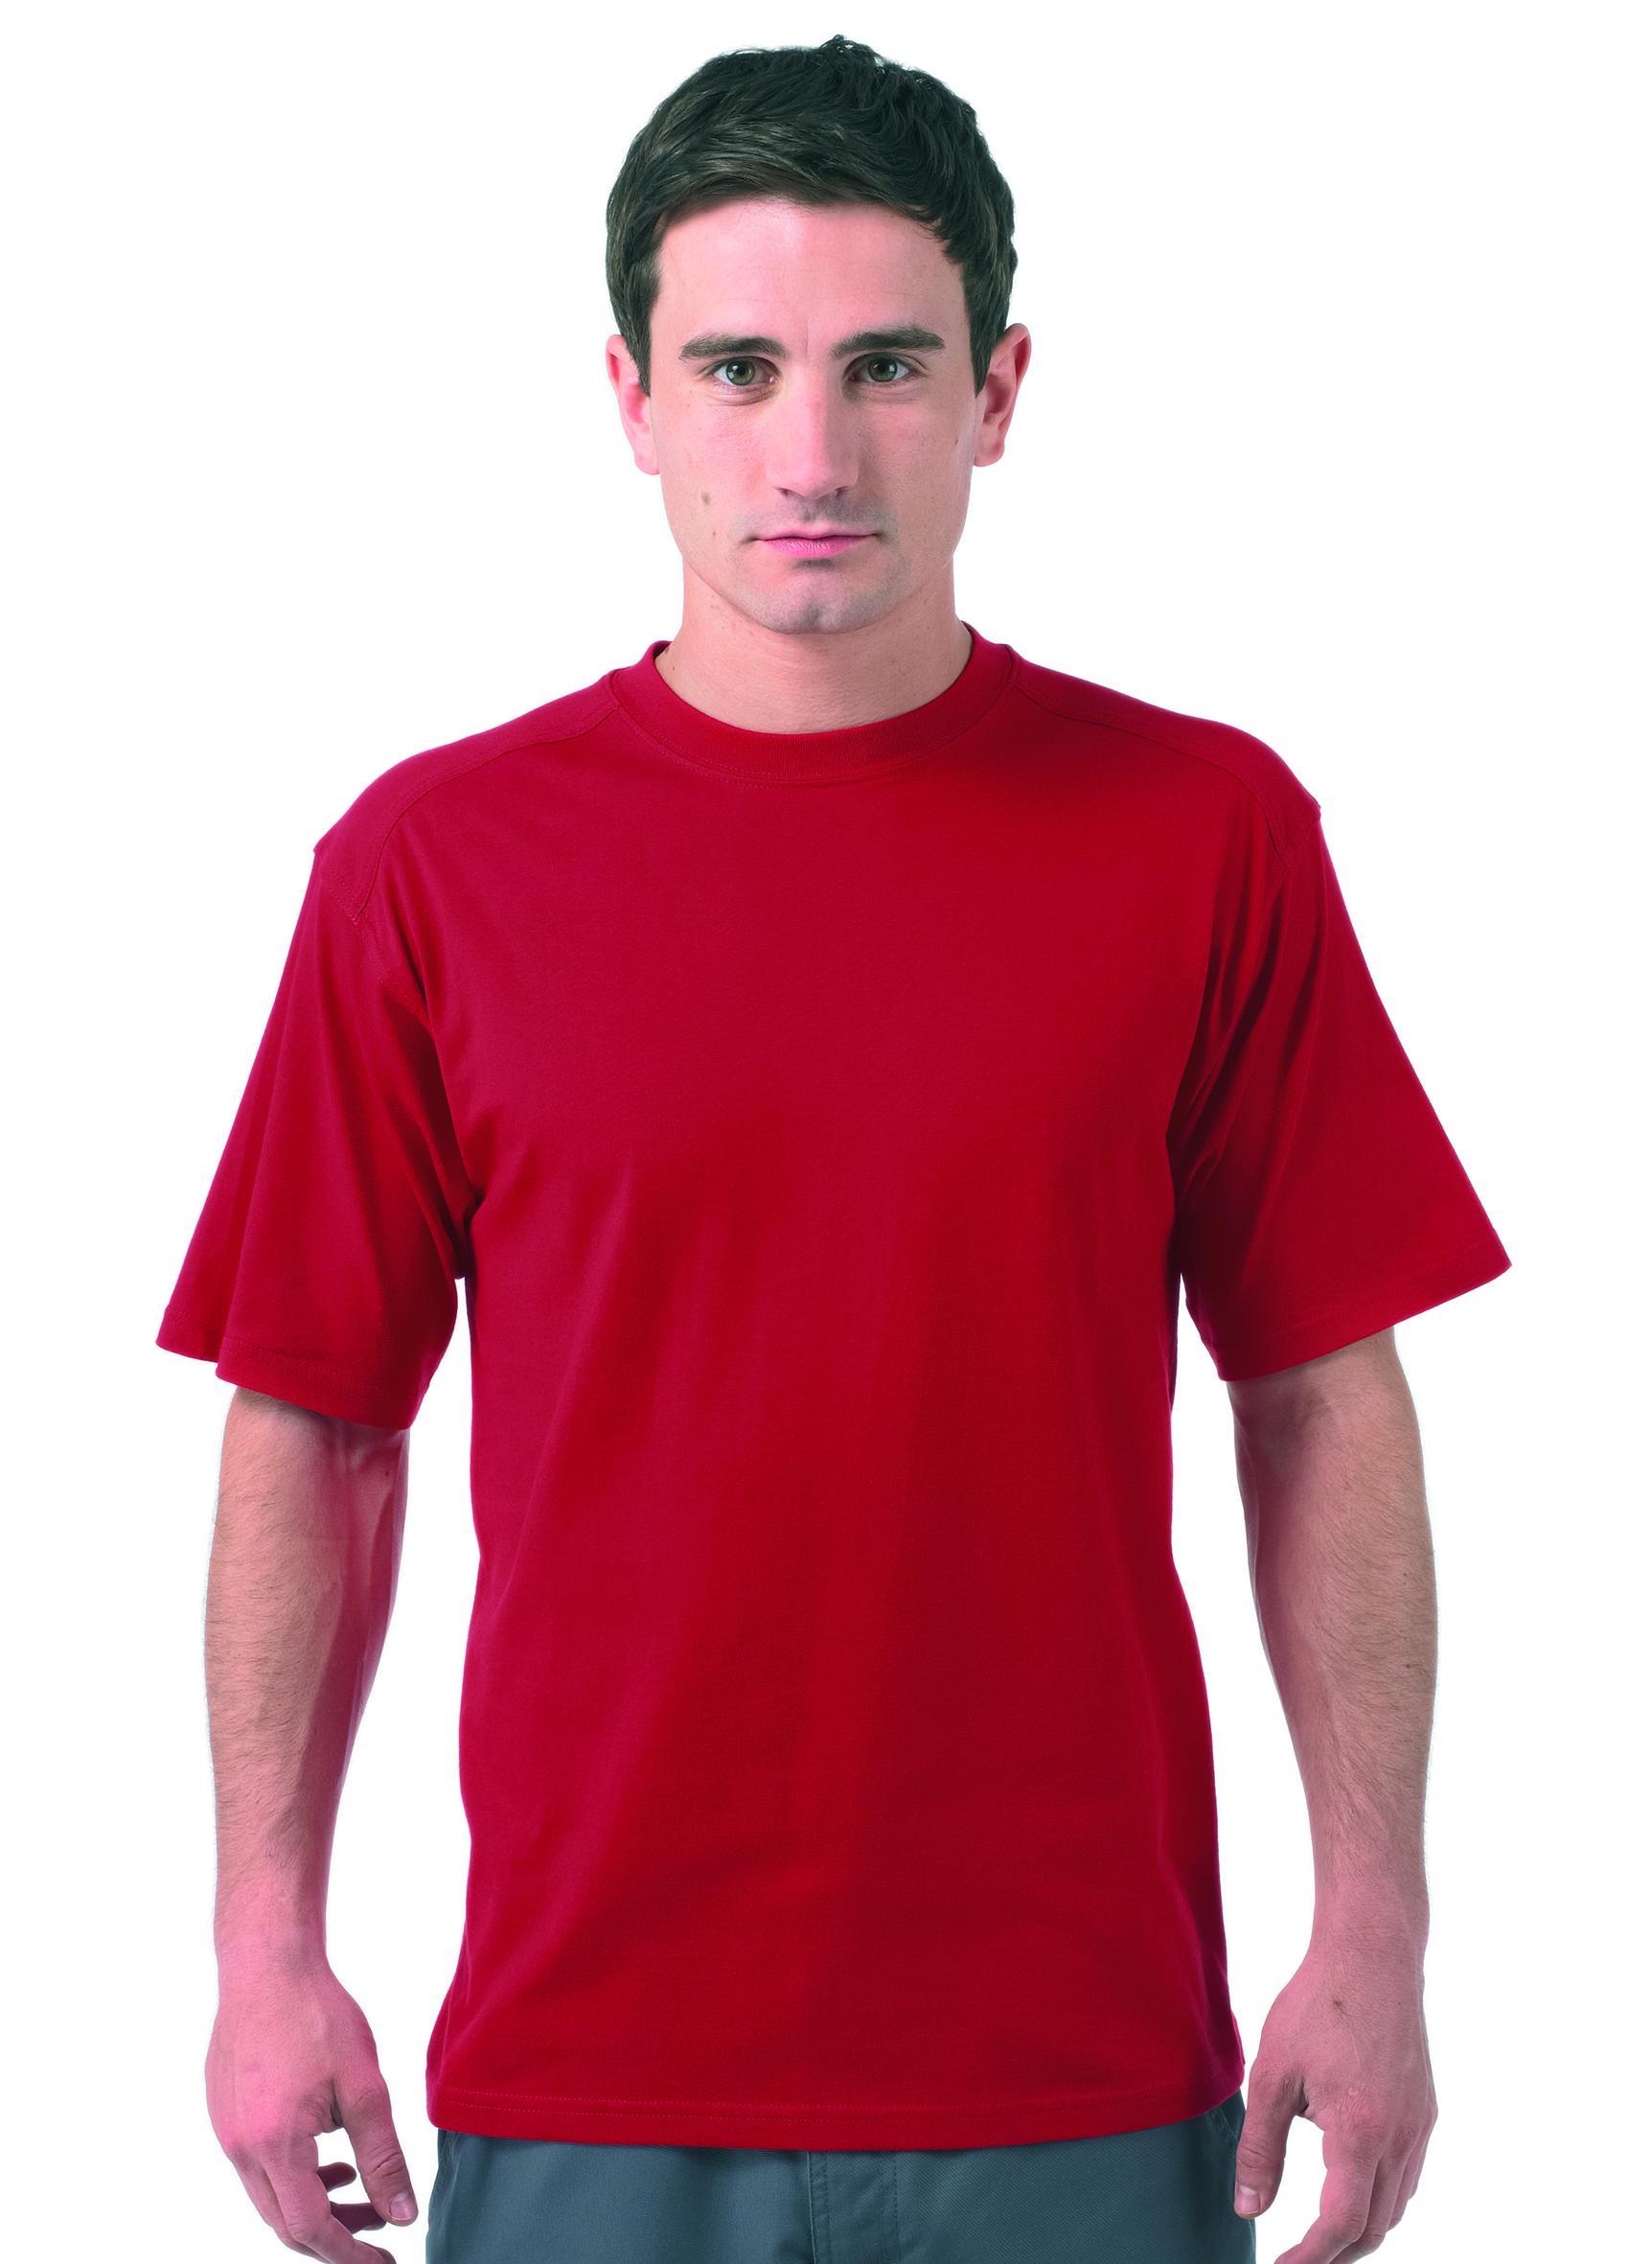 New Russell Mens Work Wear Heavy Duty Cotton T Shirt In 6